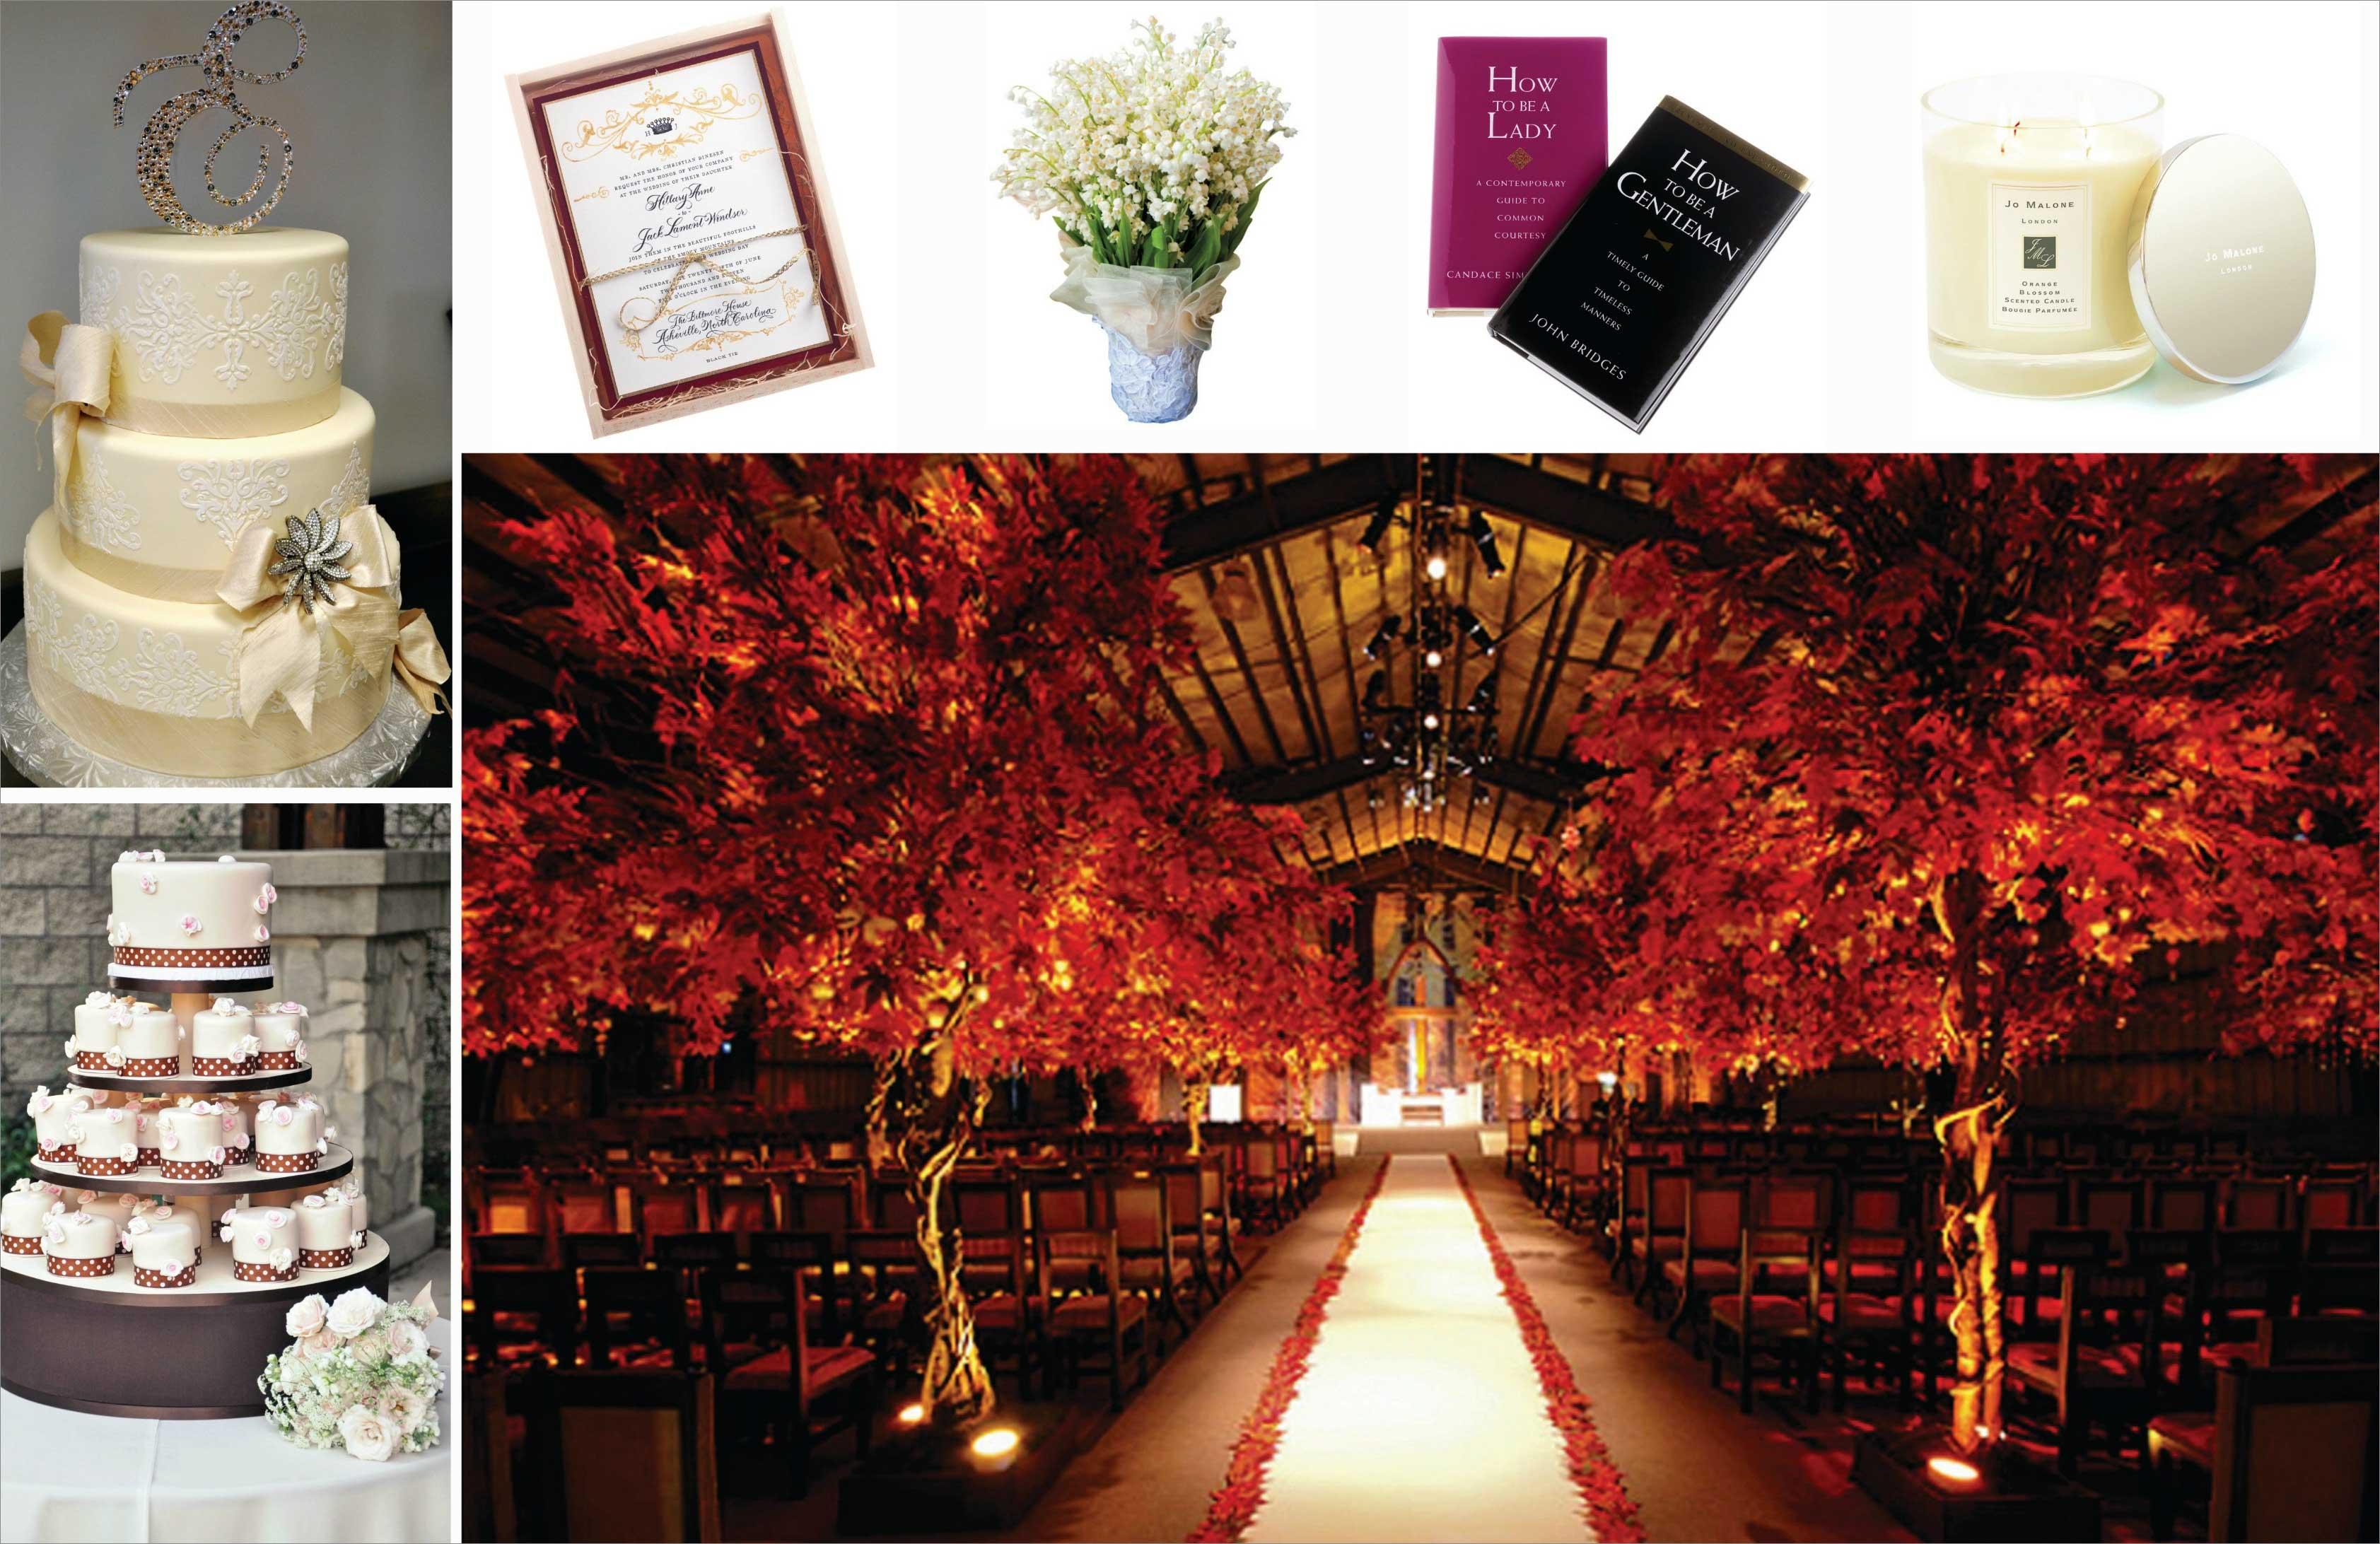 Royal wedding decor ideas